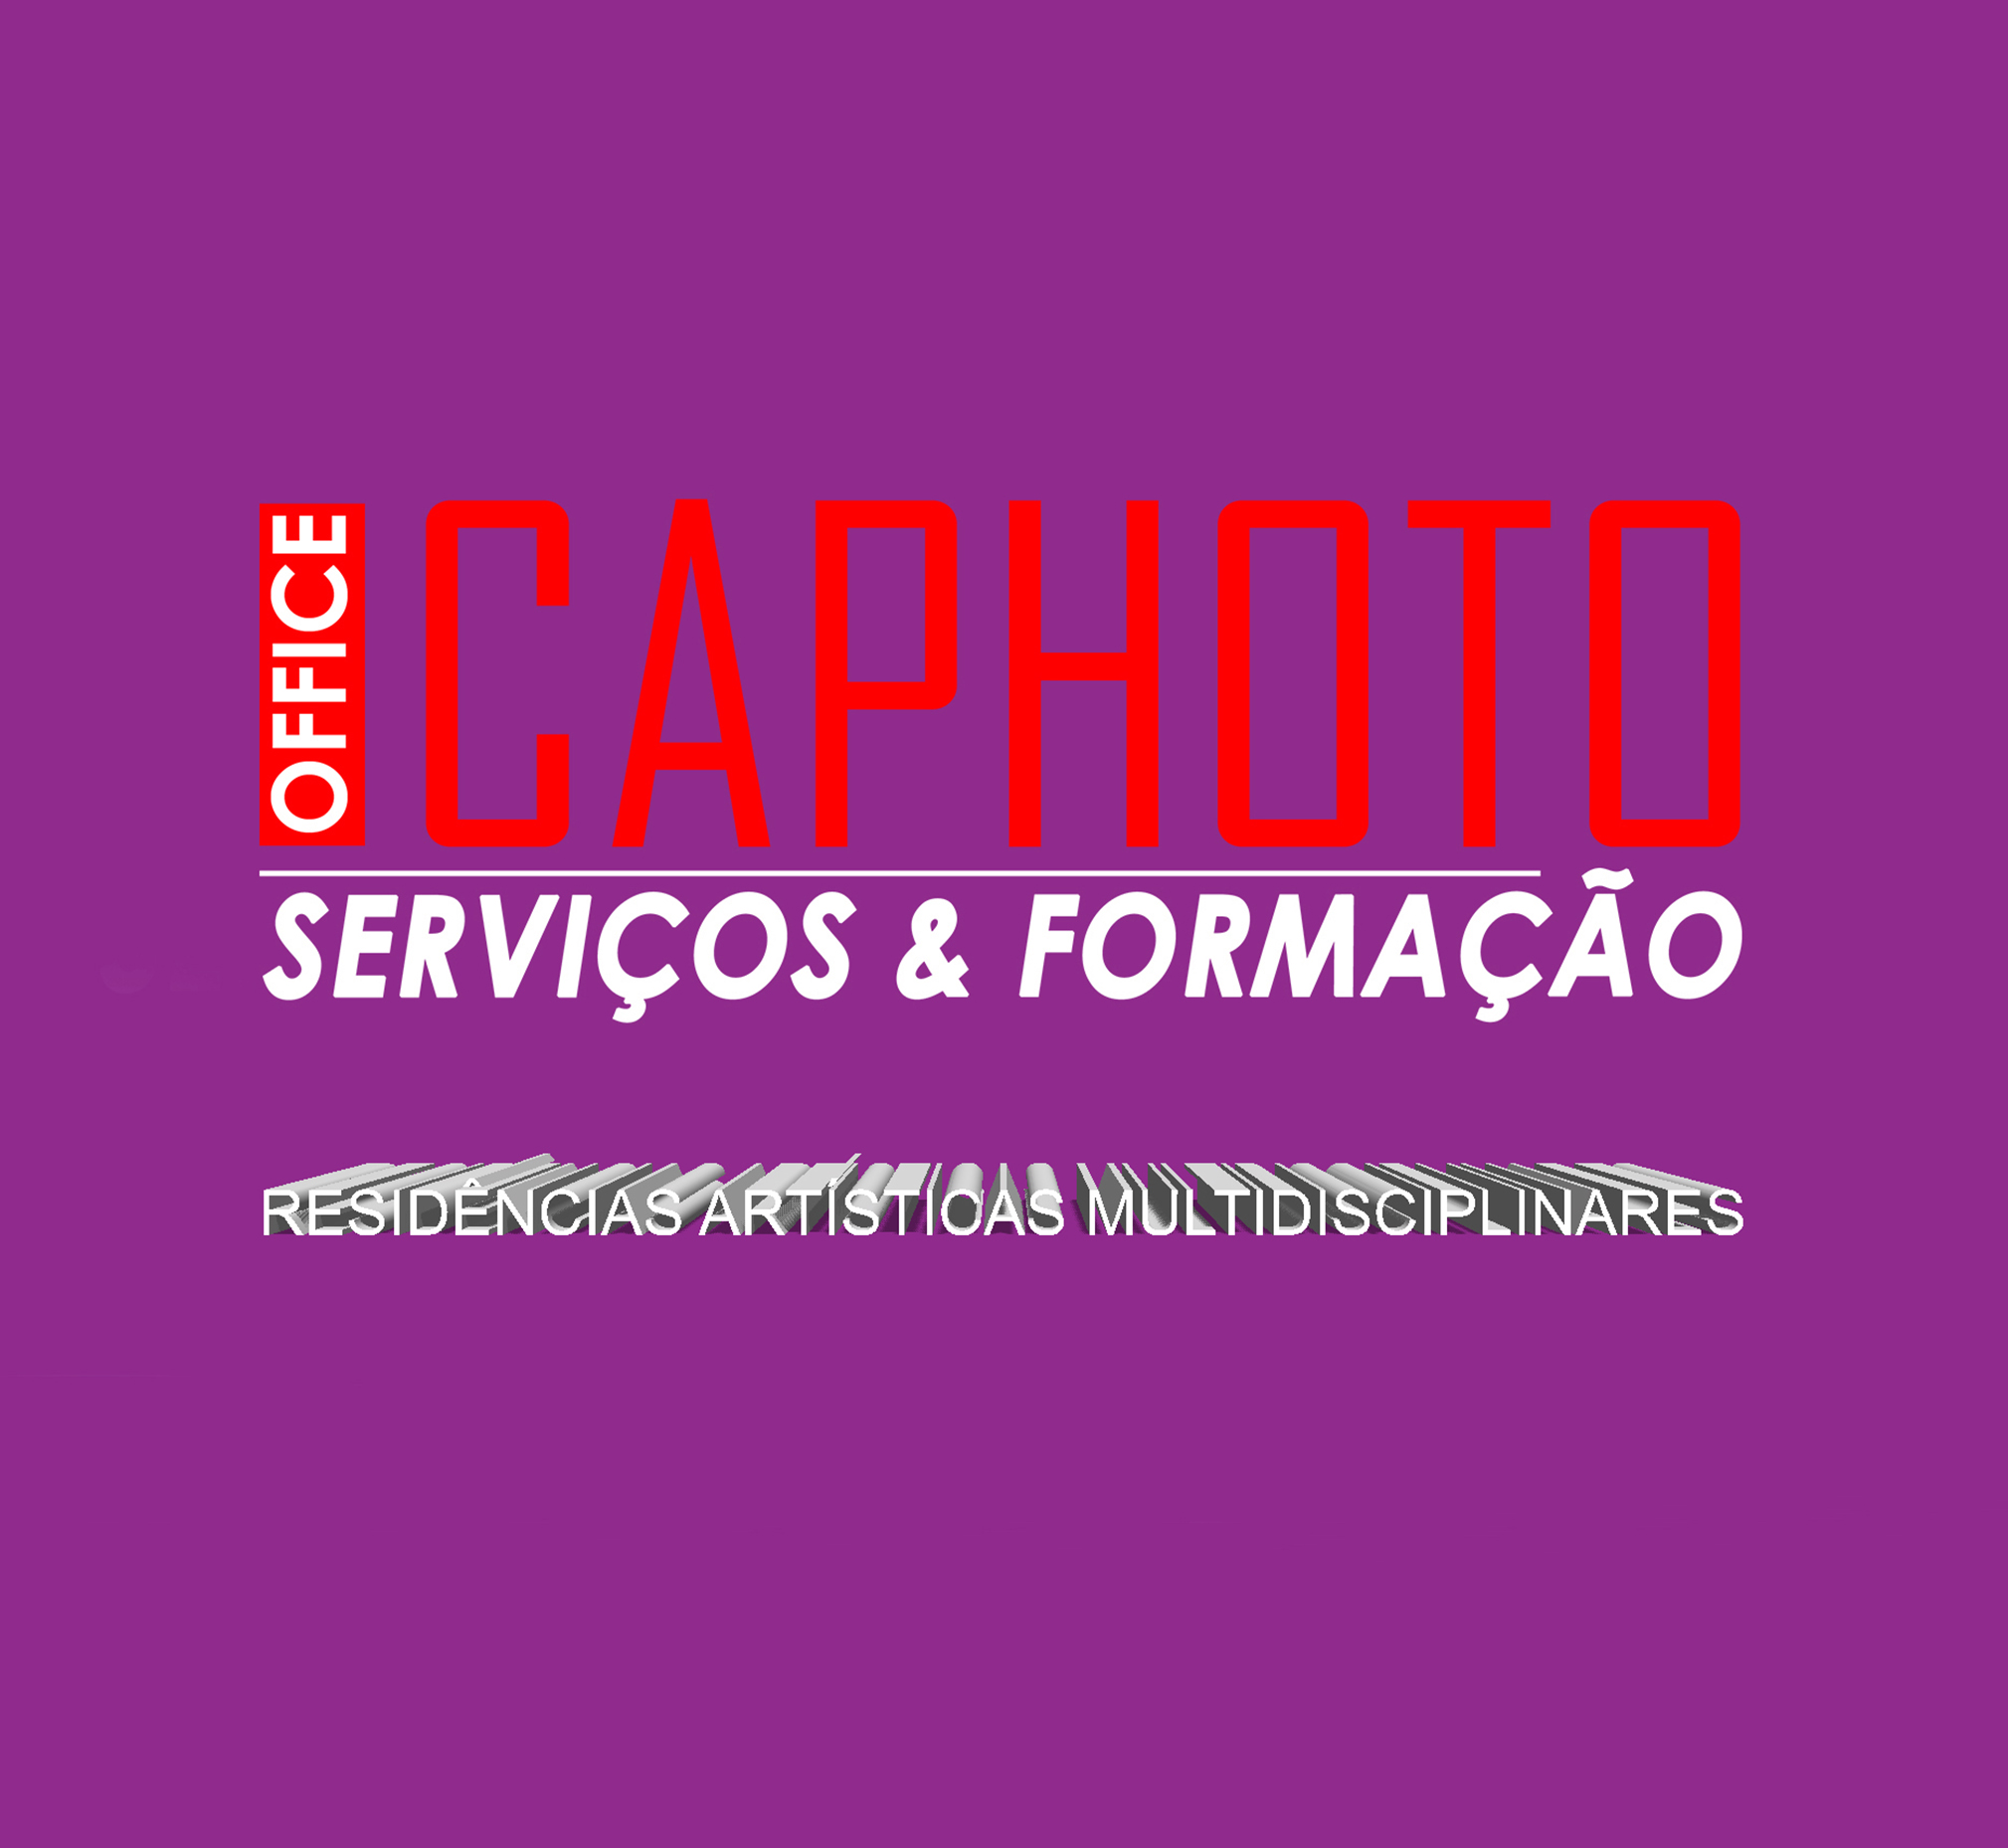 Residência Artística Multidisciplinar (R.A.M.) OFFICECAPHOTO.PT